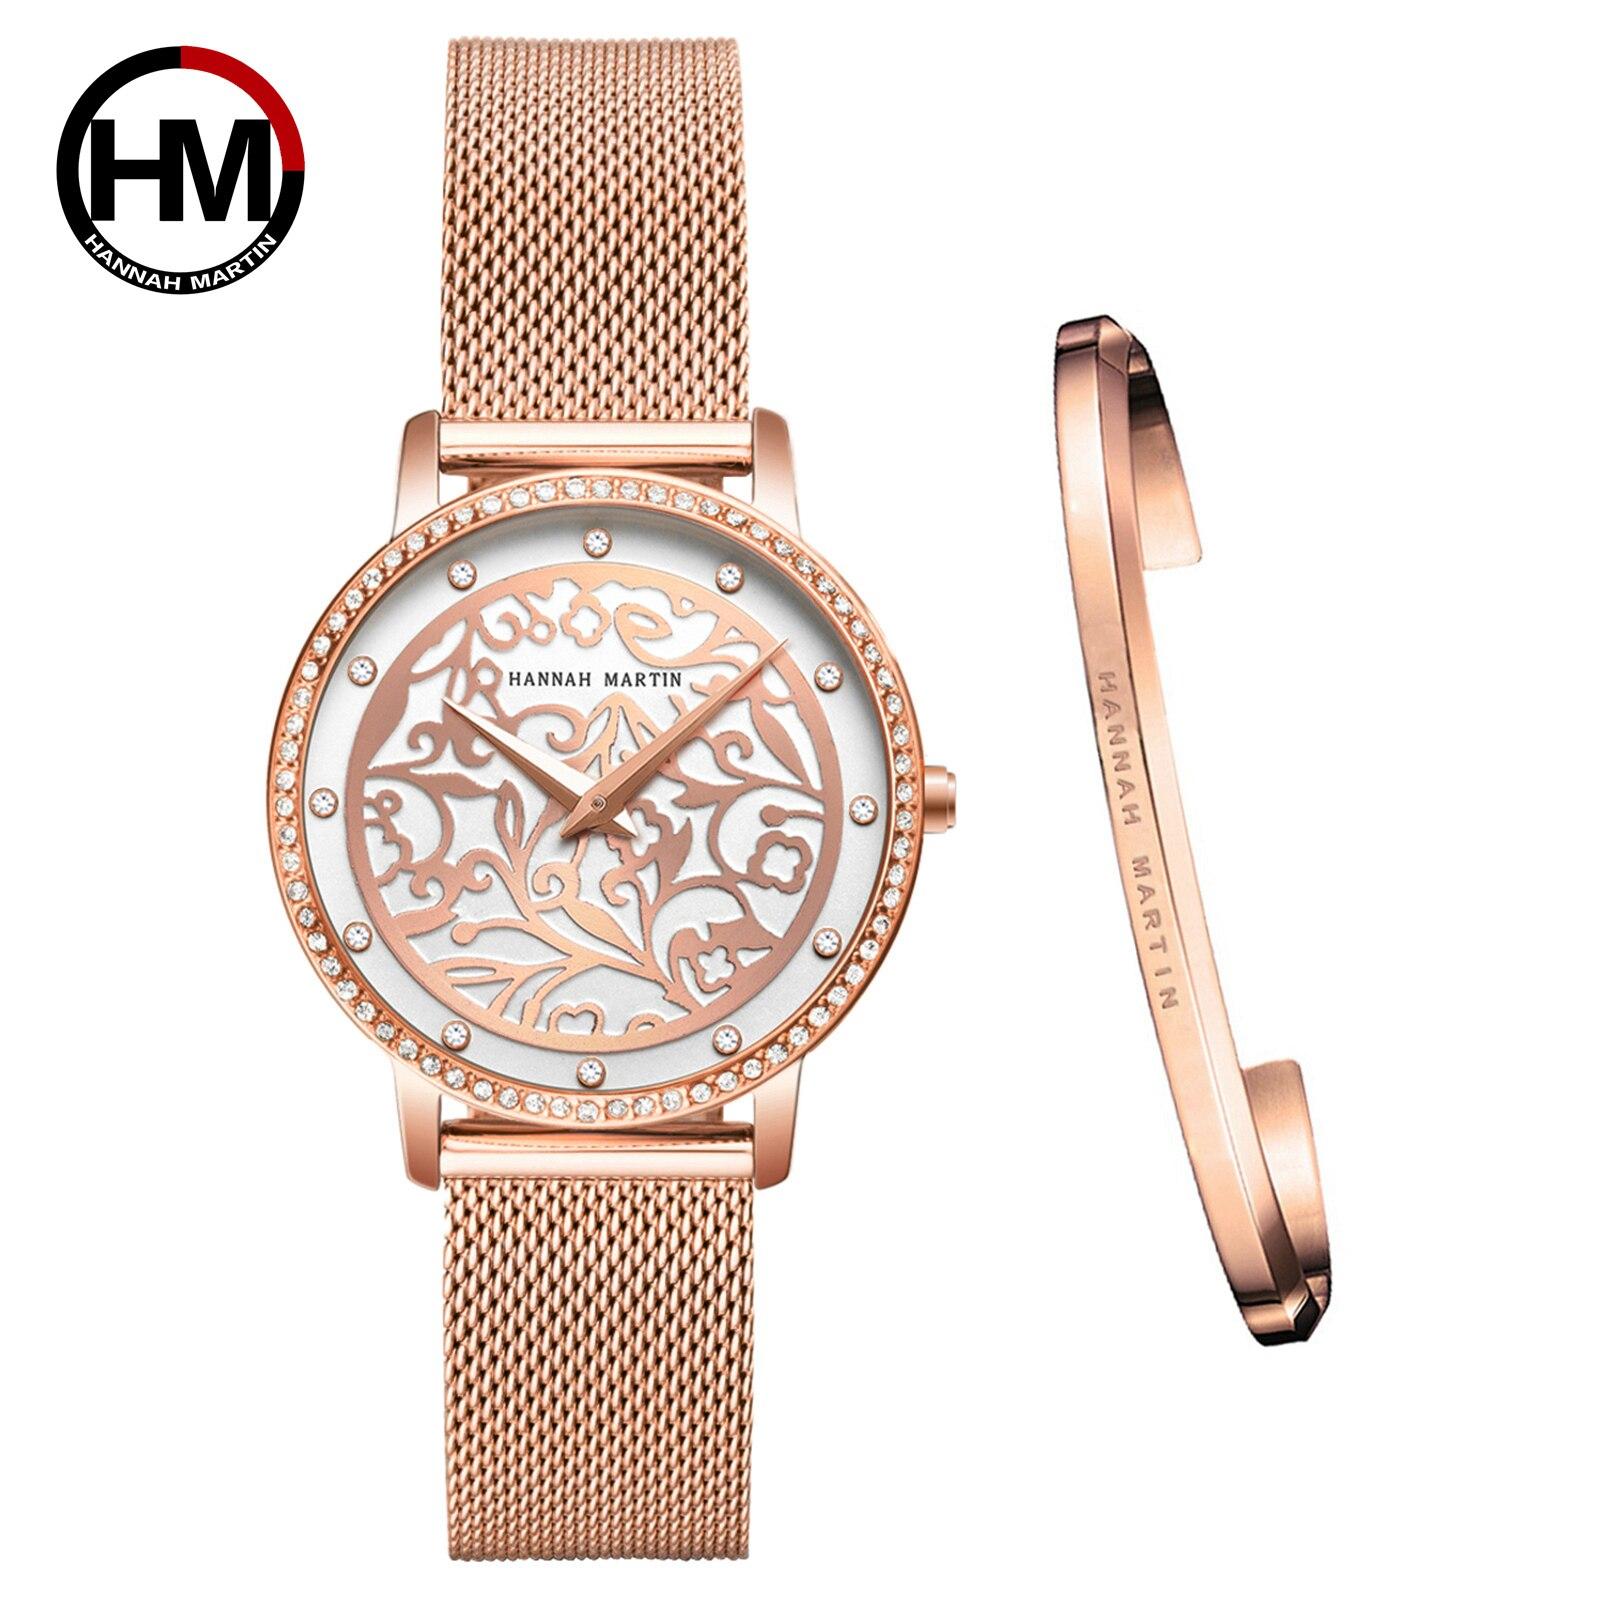 New 1 Set Bracelet Japanese Movement Quartz Ladies Women Stainless Steel Mesh Casual Waterproof Wrist Watch Gift For Female Women's Watches     - title=